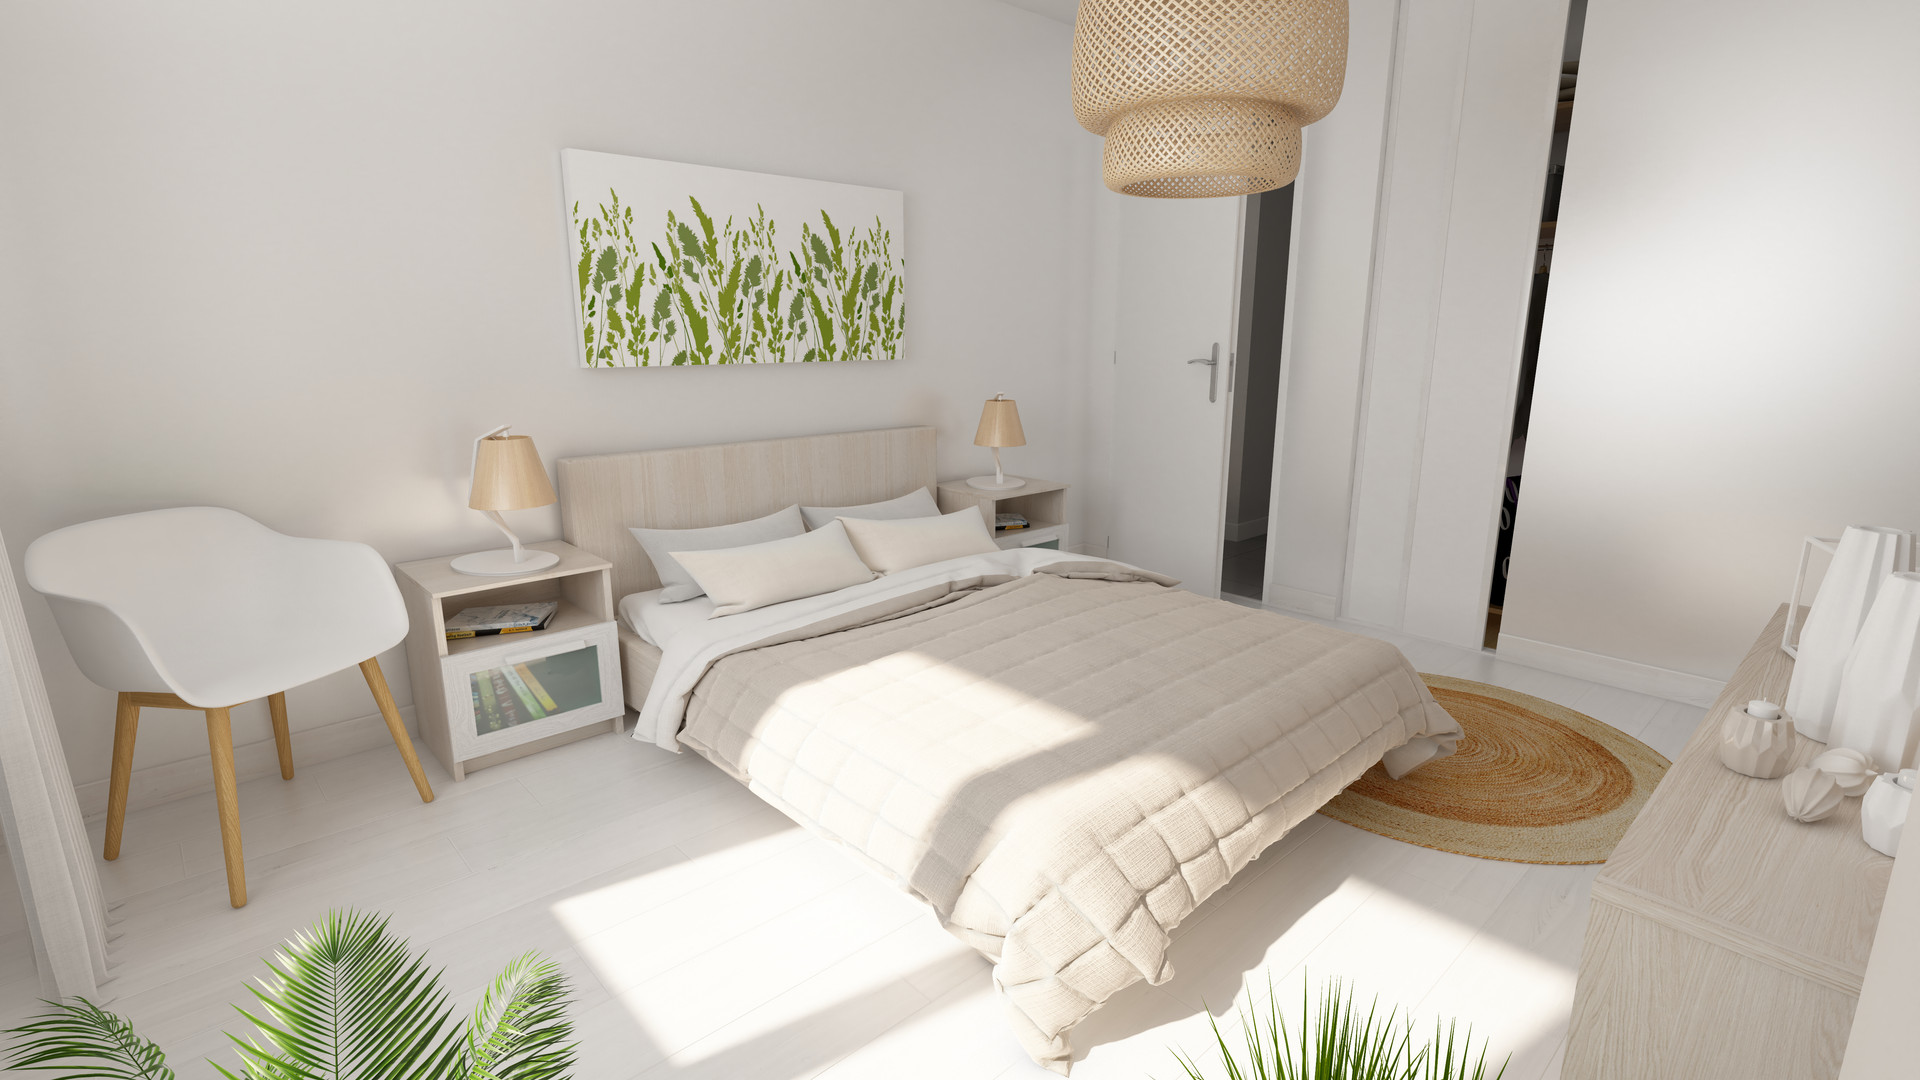 IS_3_0010-chambre(1).jpg